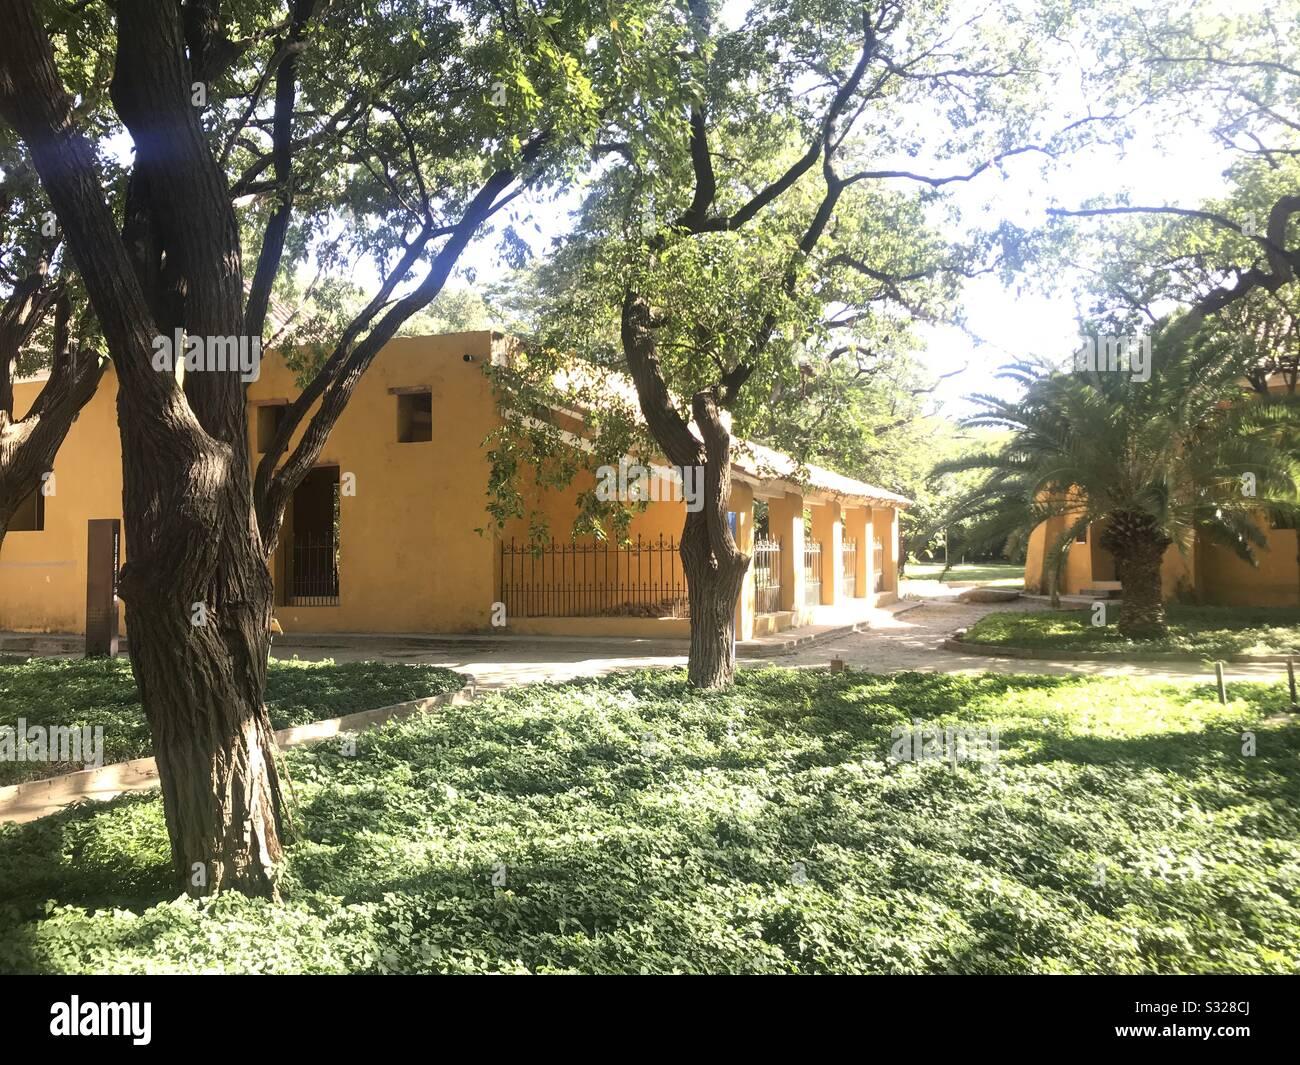 Villa San Pedro De Alejandrino Santa Marta Colombia Where Simon Bolivar Died Stock Photo Alamy